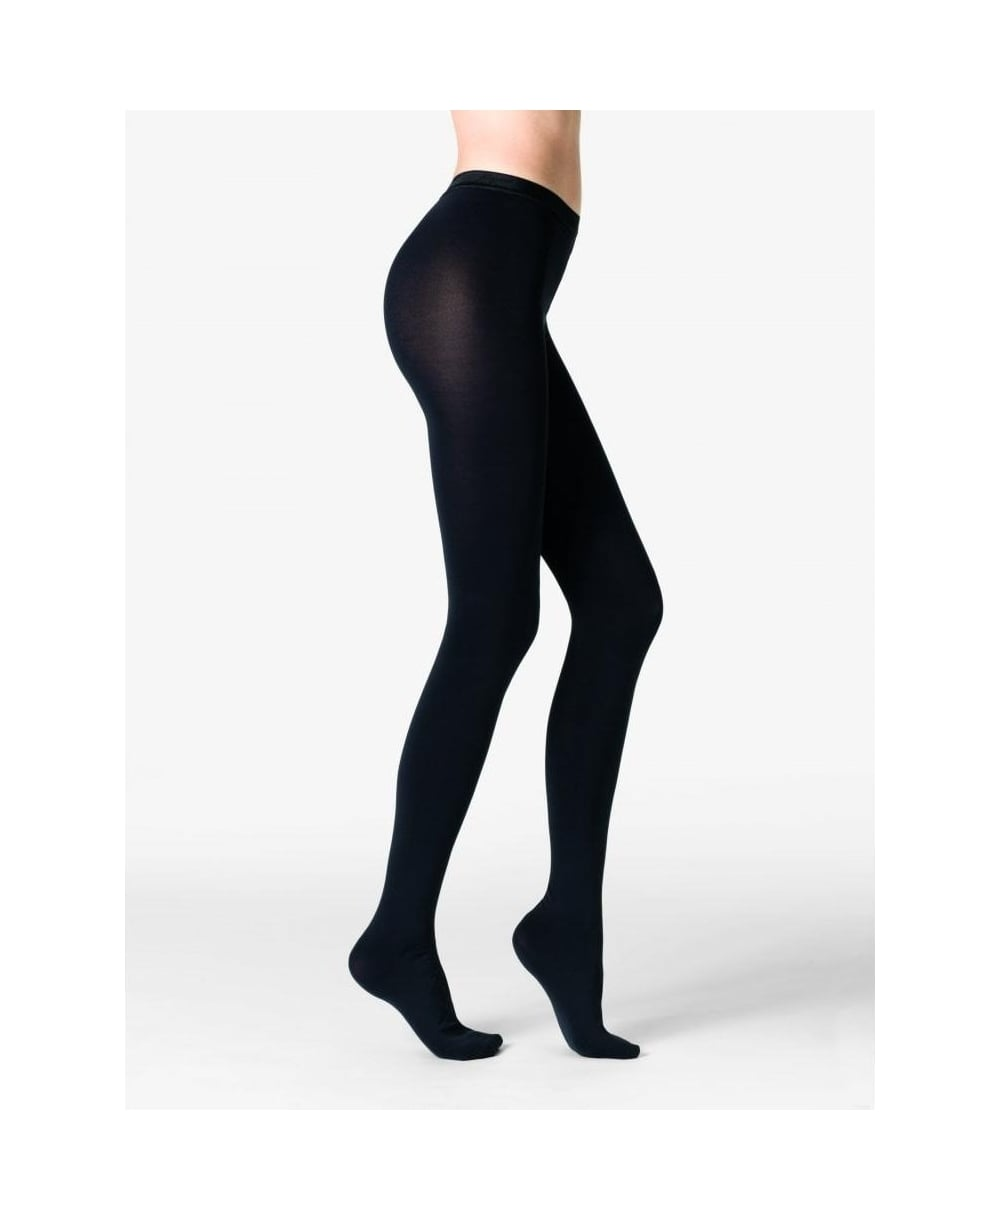 1dca55d187b Fogal Noir Absolu 100 Denier Tights - Tights from luxury-legs.com UK